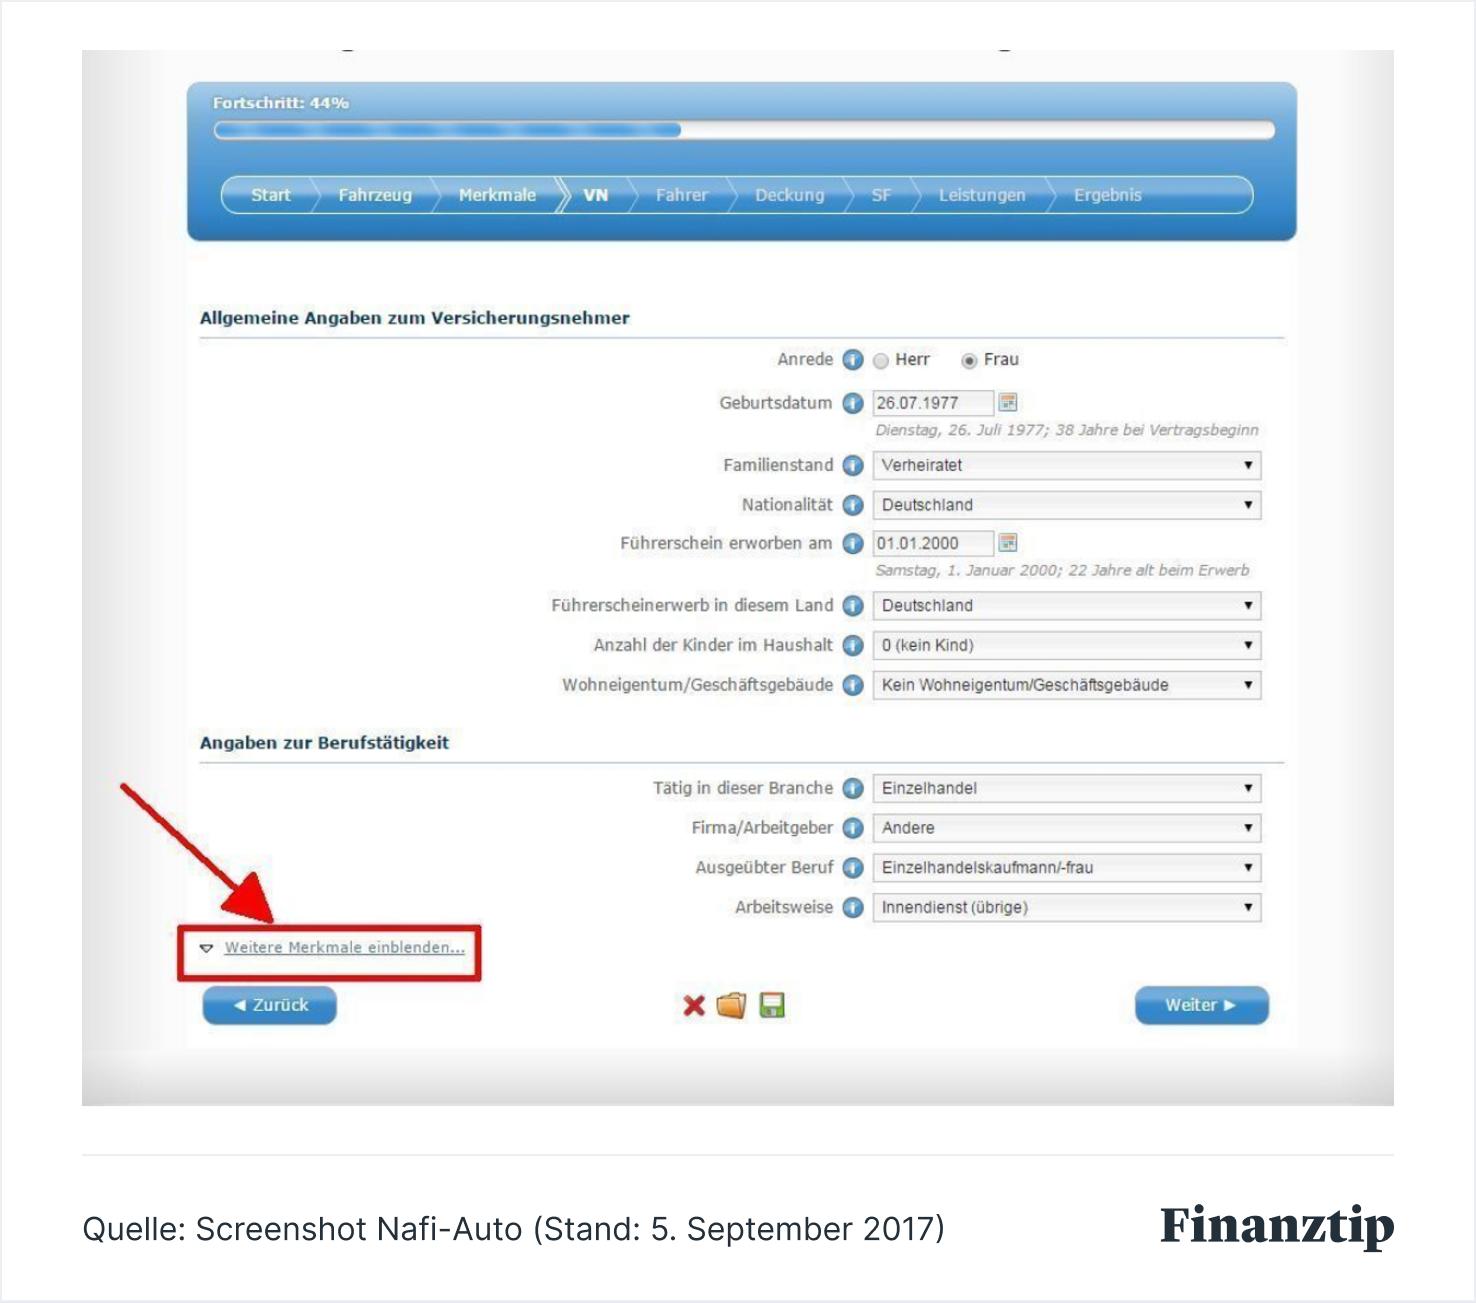 Huk24 Autoversicherung Berechnen : kfz versicherungsrechner so berechnen sie ihre autoversicherung check24 verivox nafi huk24 ~ Themetempest.com Abrechnung